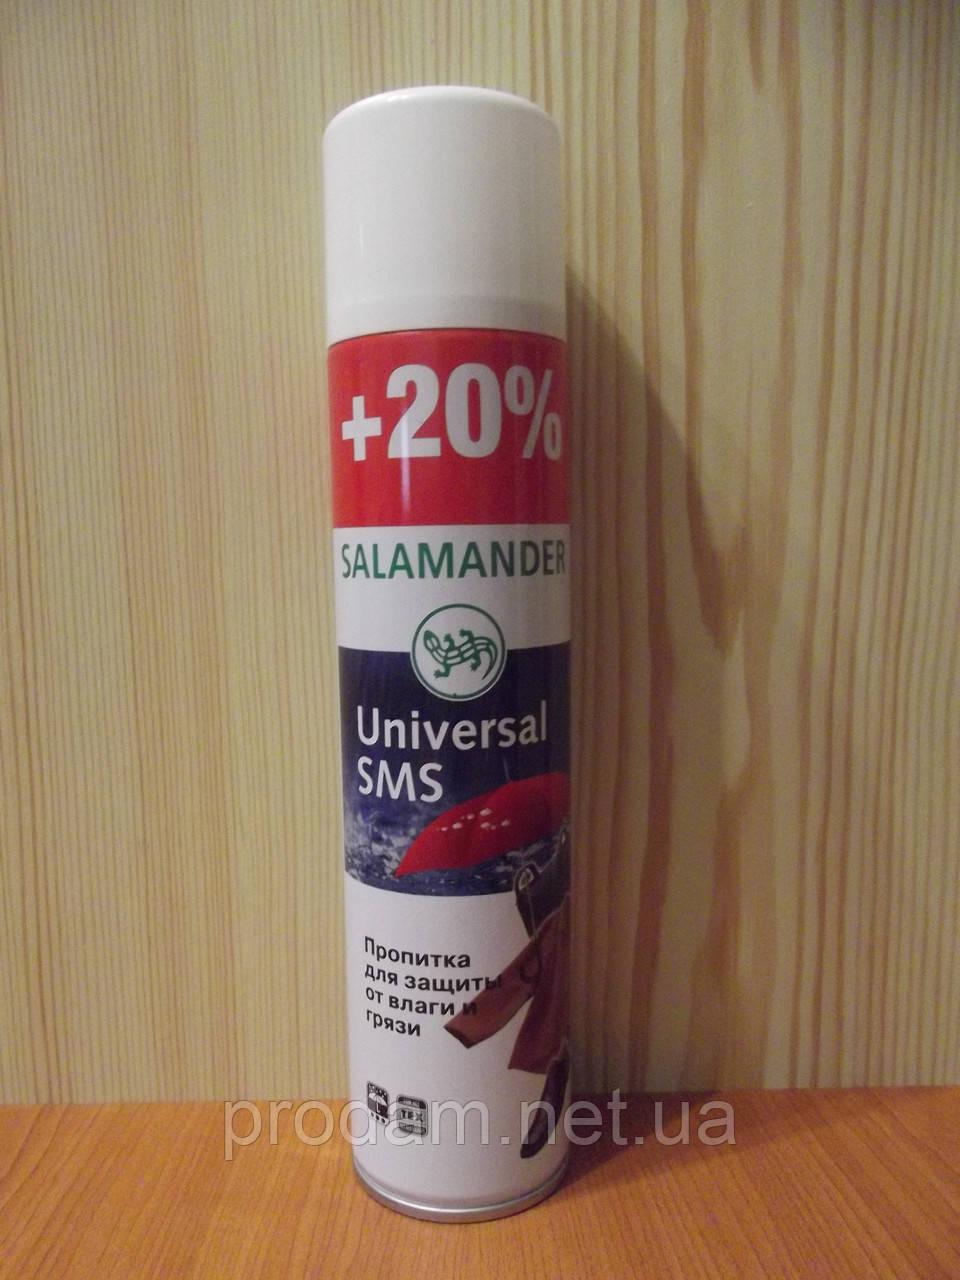 Salamander Аерозоль Universal SMS